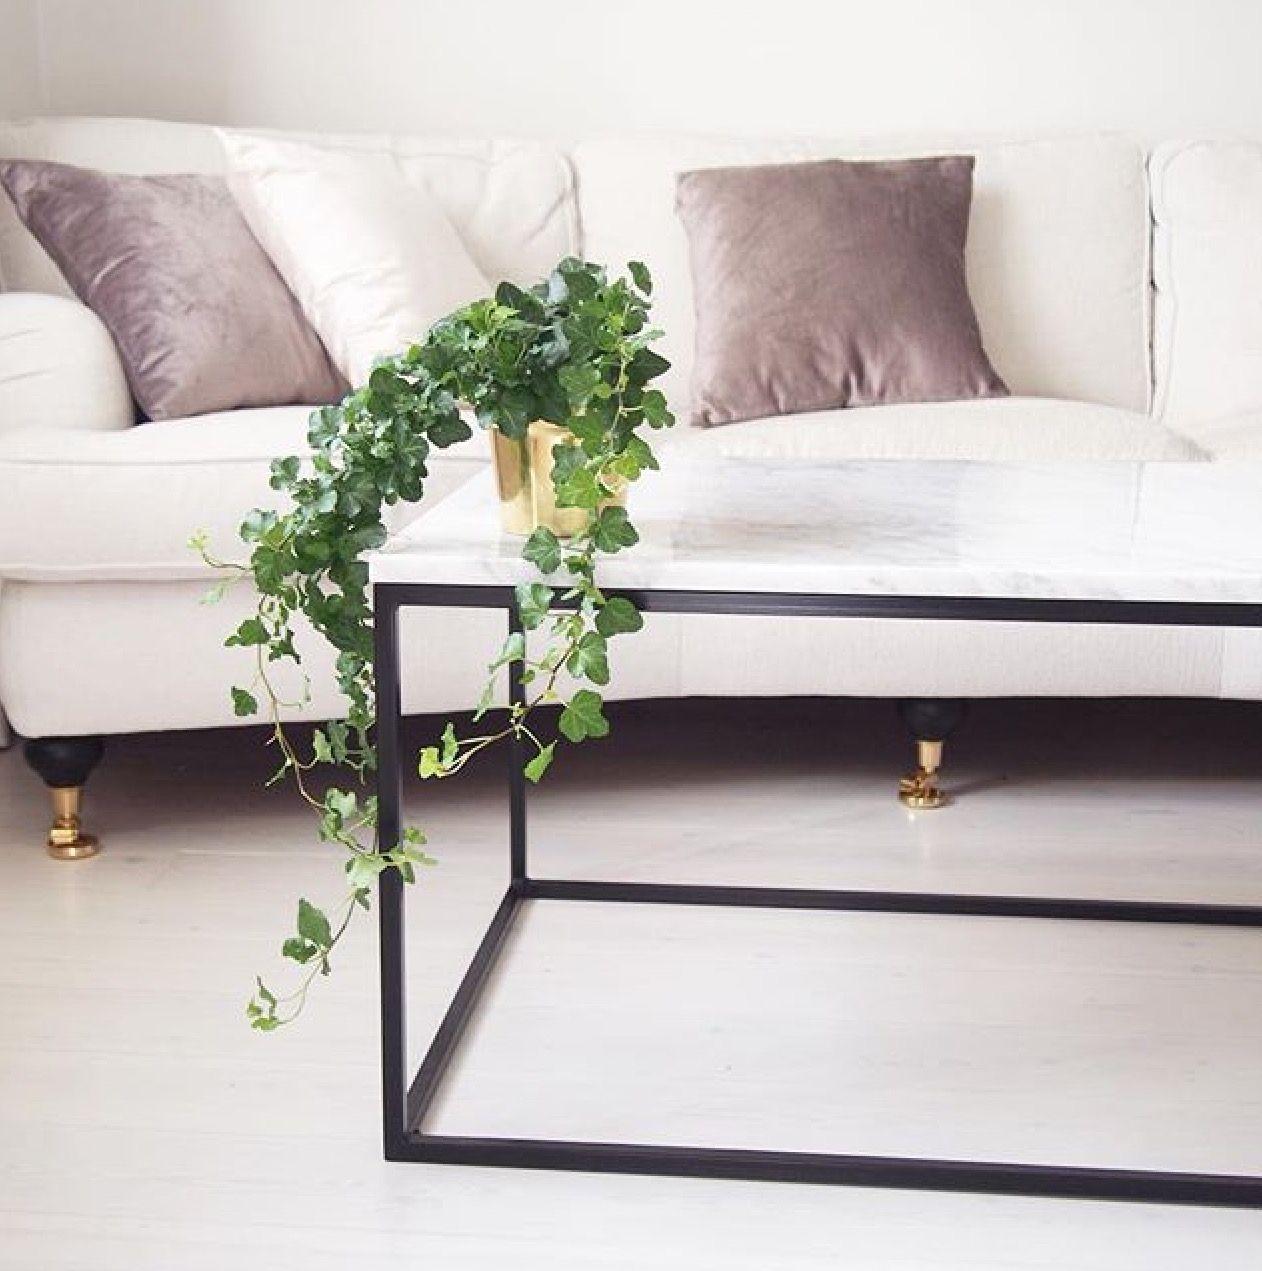 Soffbord 100 x 60 x45 5595 SEK www byingerois com marmor, marmorbord, soffbord, marble, carrara